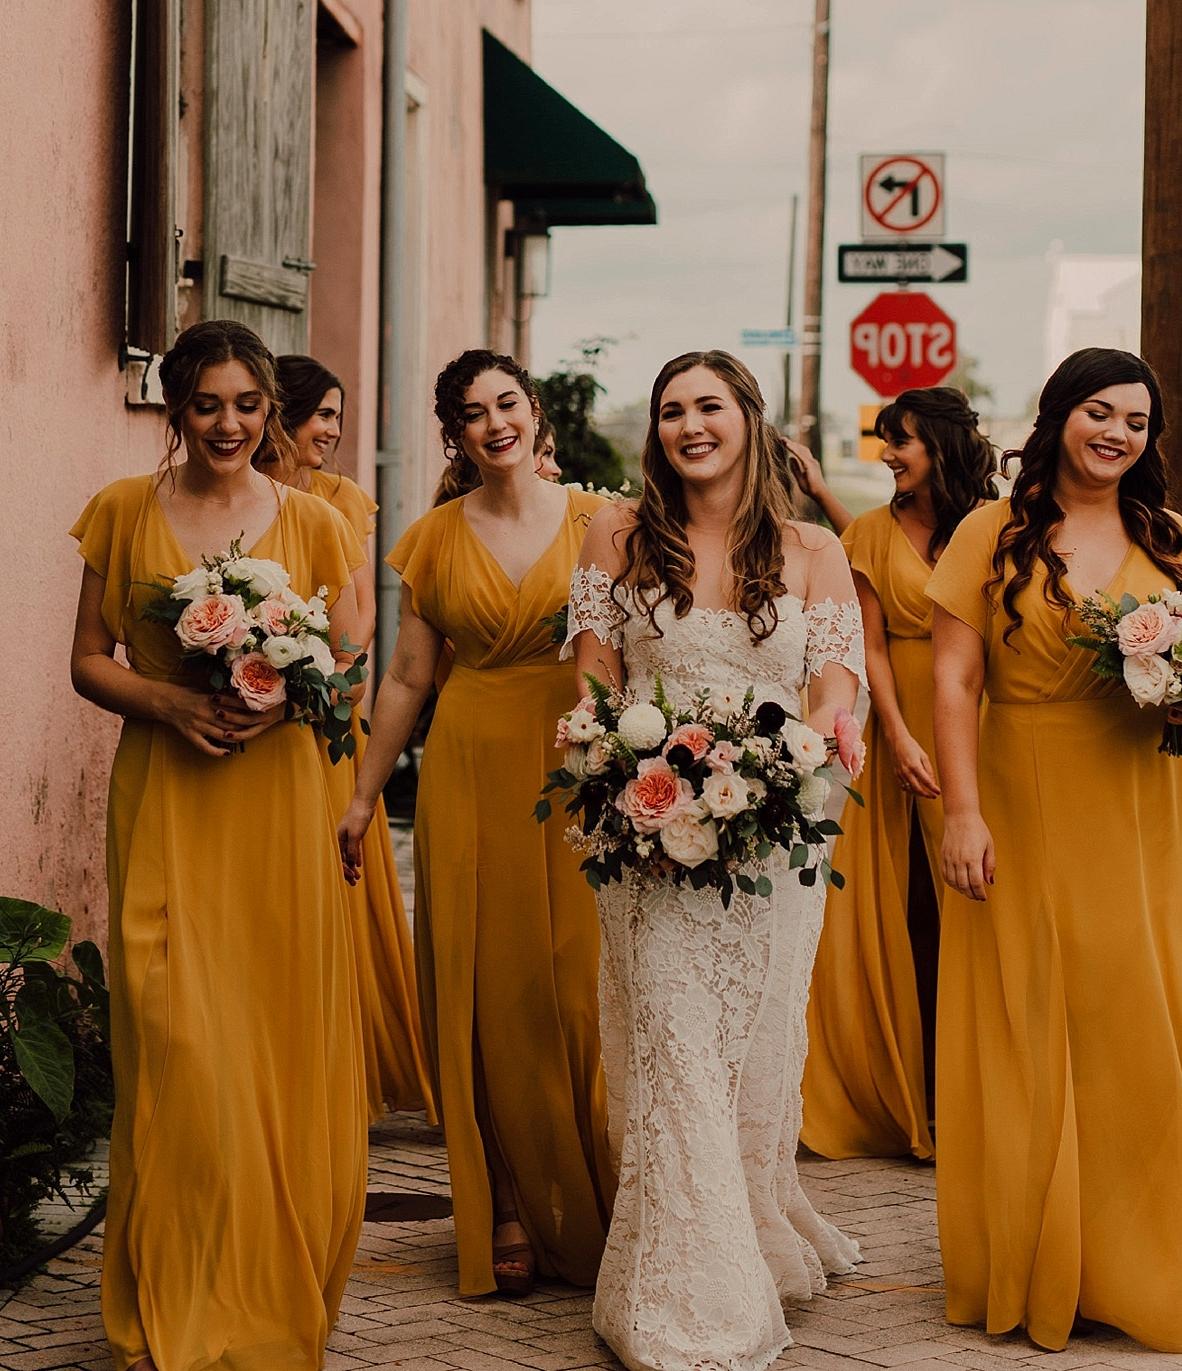 mustard bridesmaids dresses